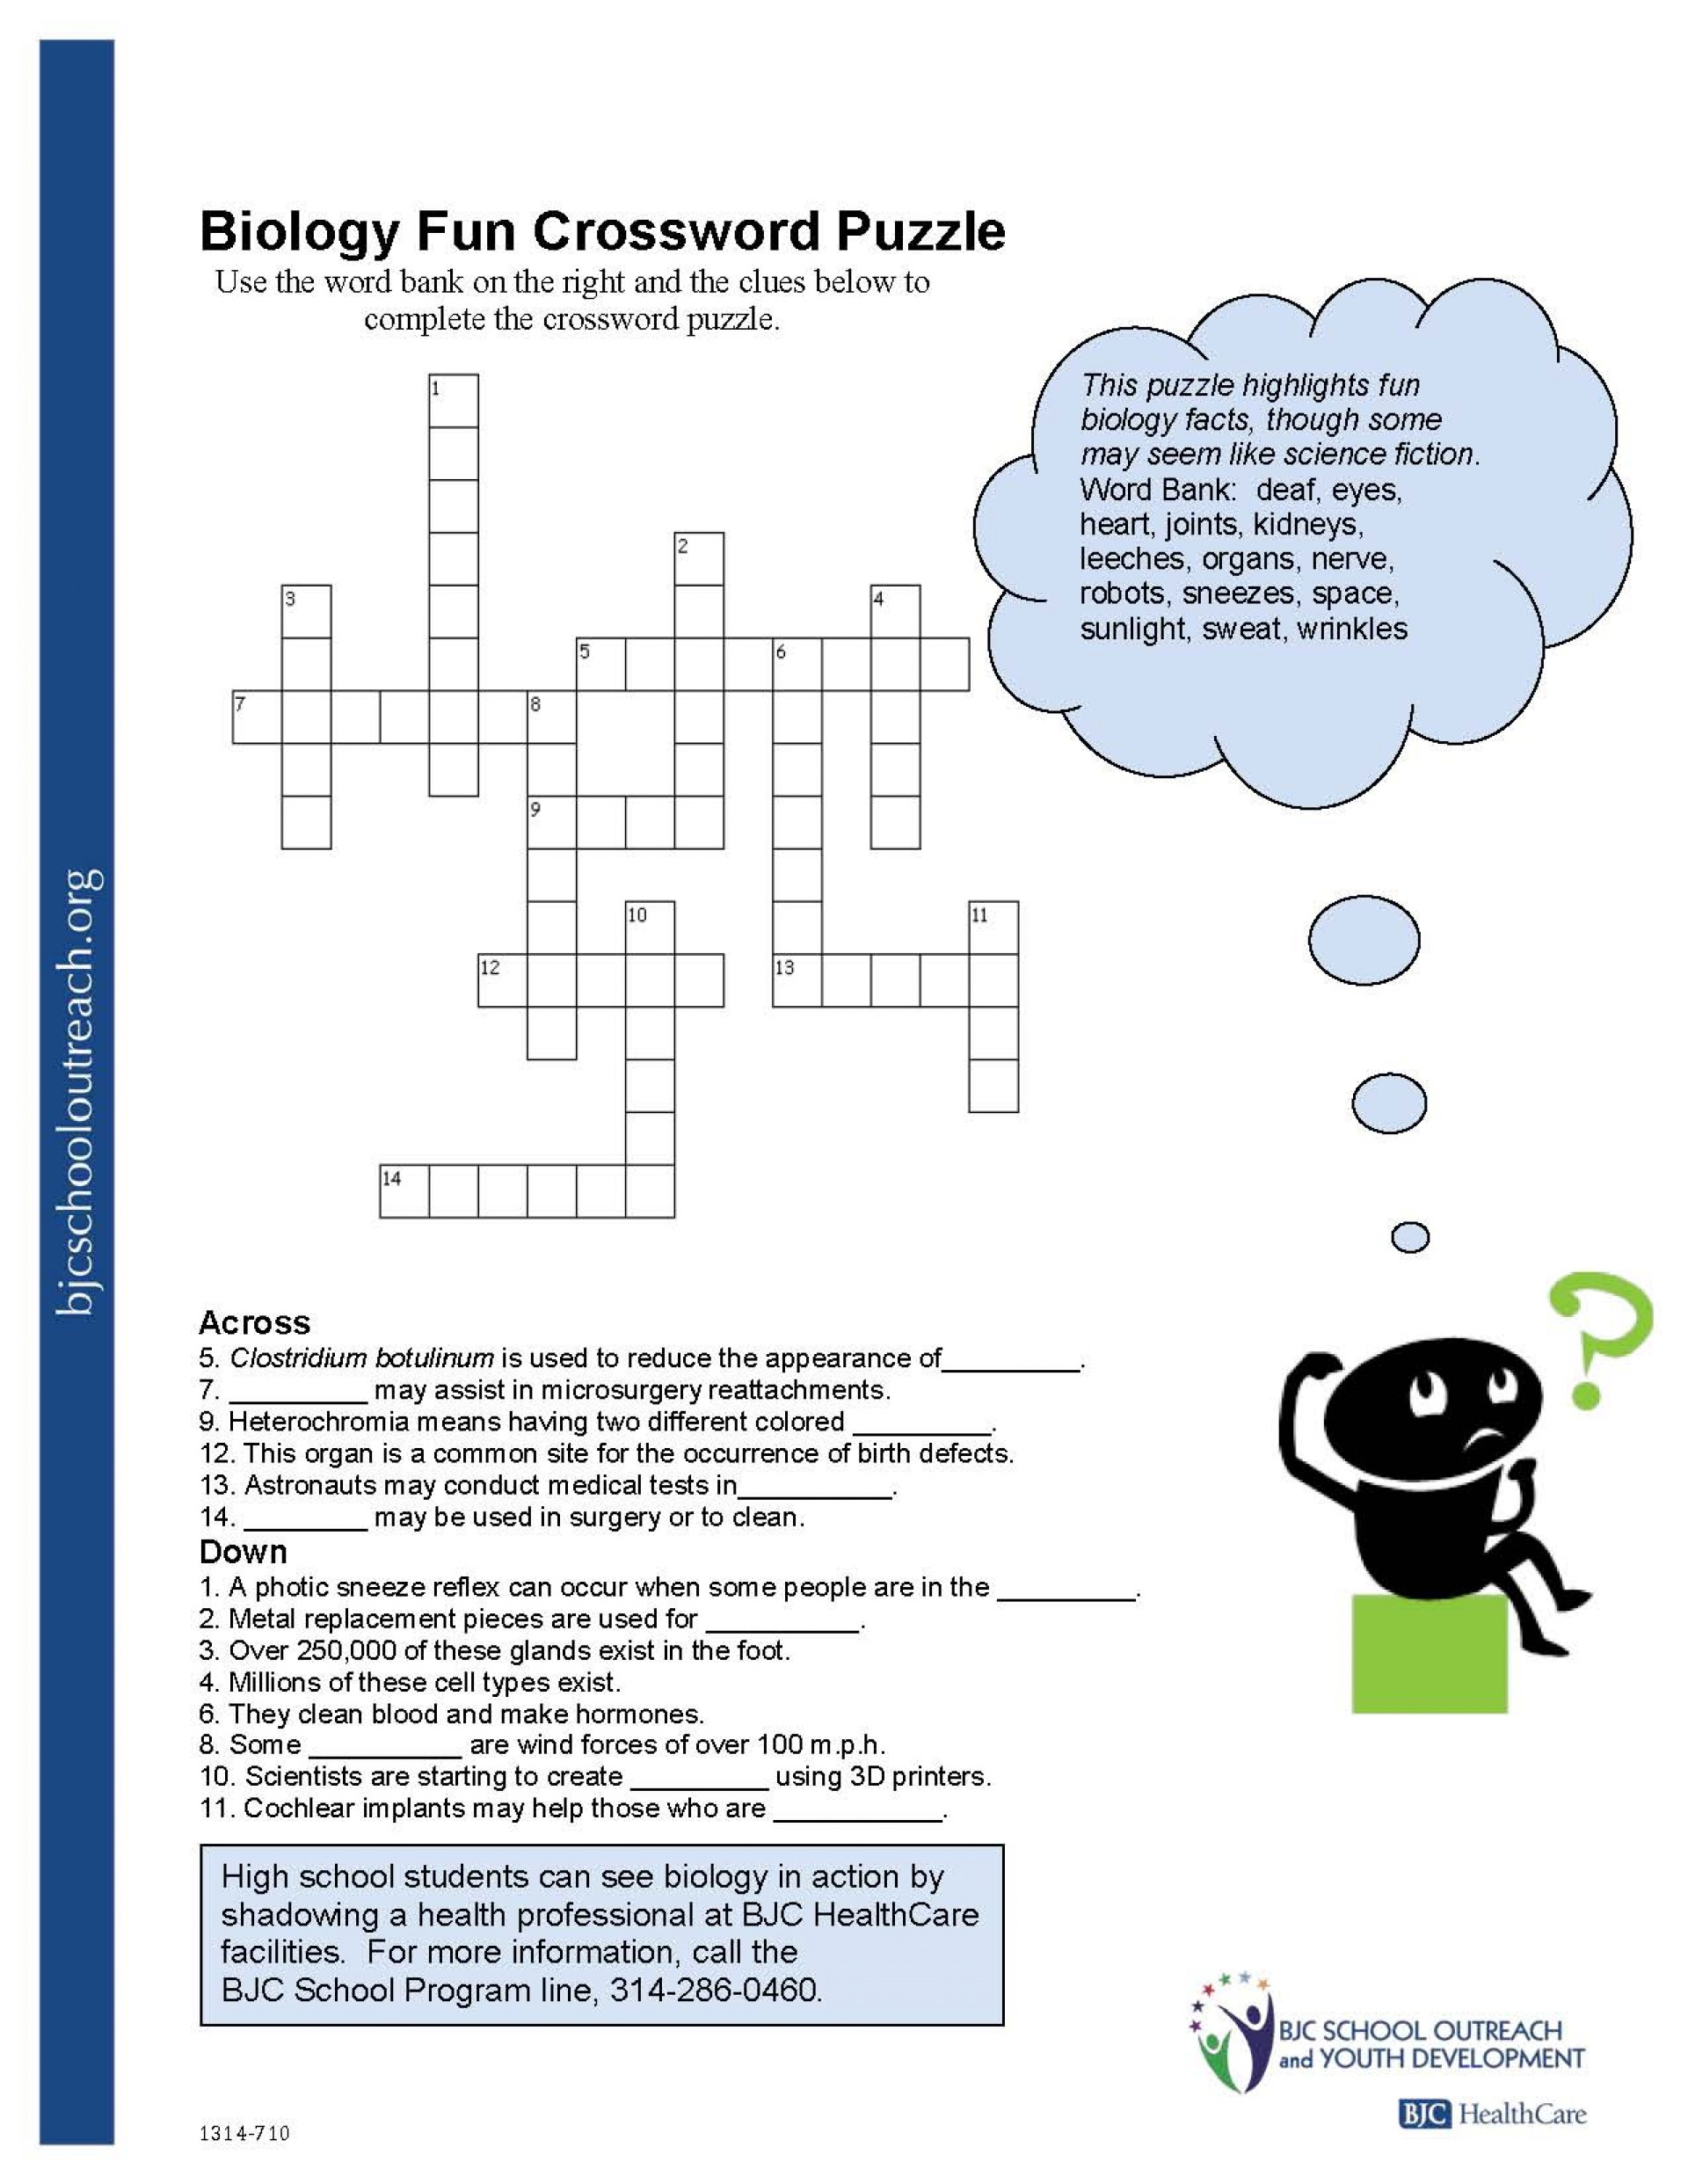 Crosswords Crossword Puzzle Worksheets For Middle School Biology Fun - Free Printable Biology Worksheets For High School